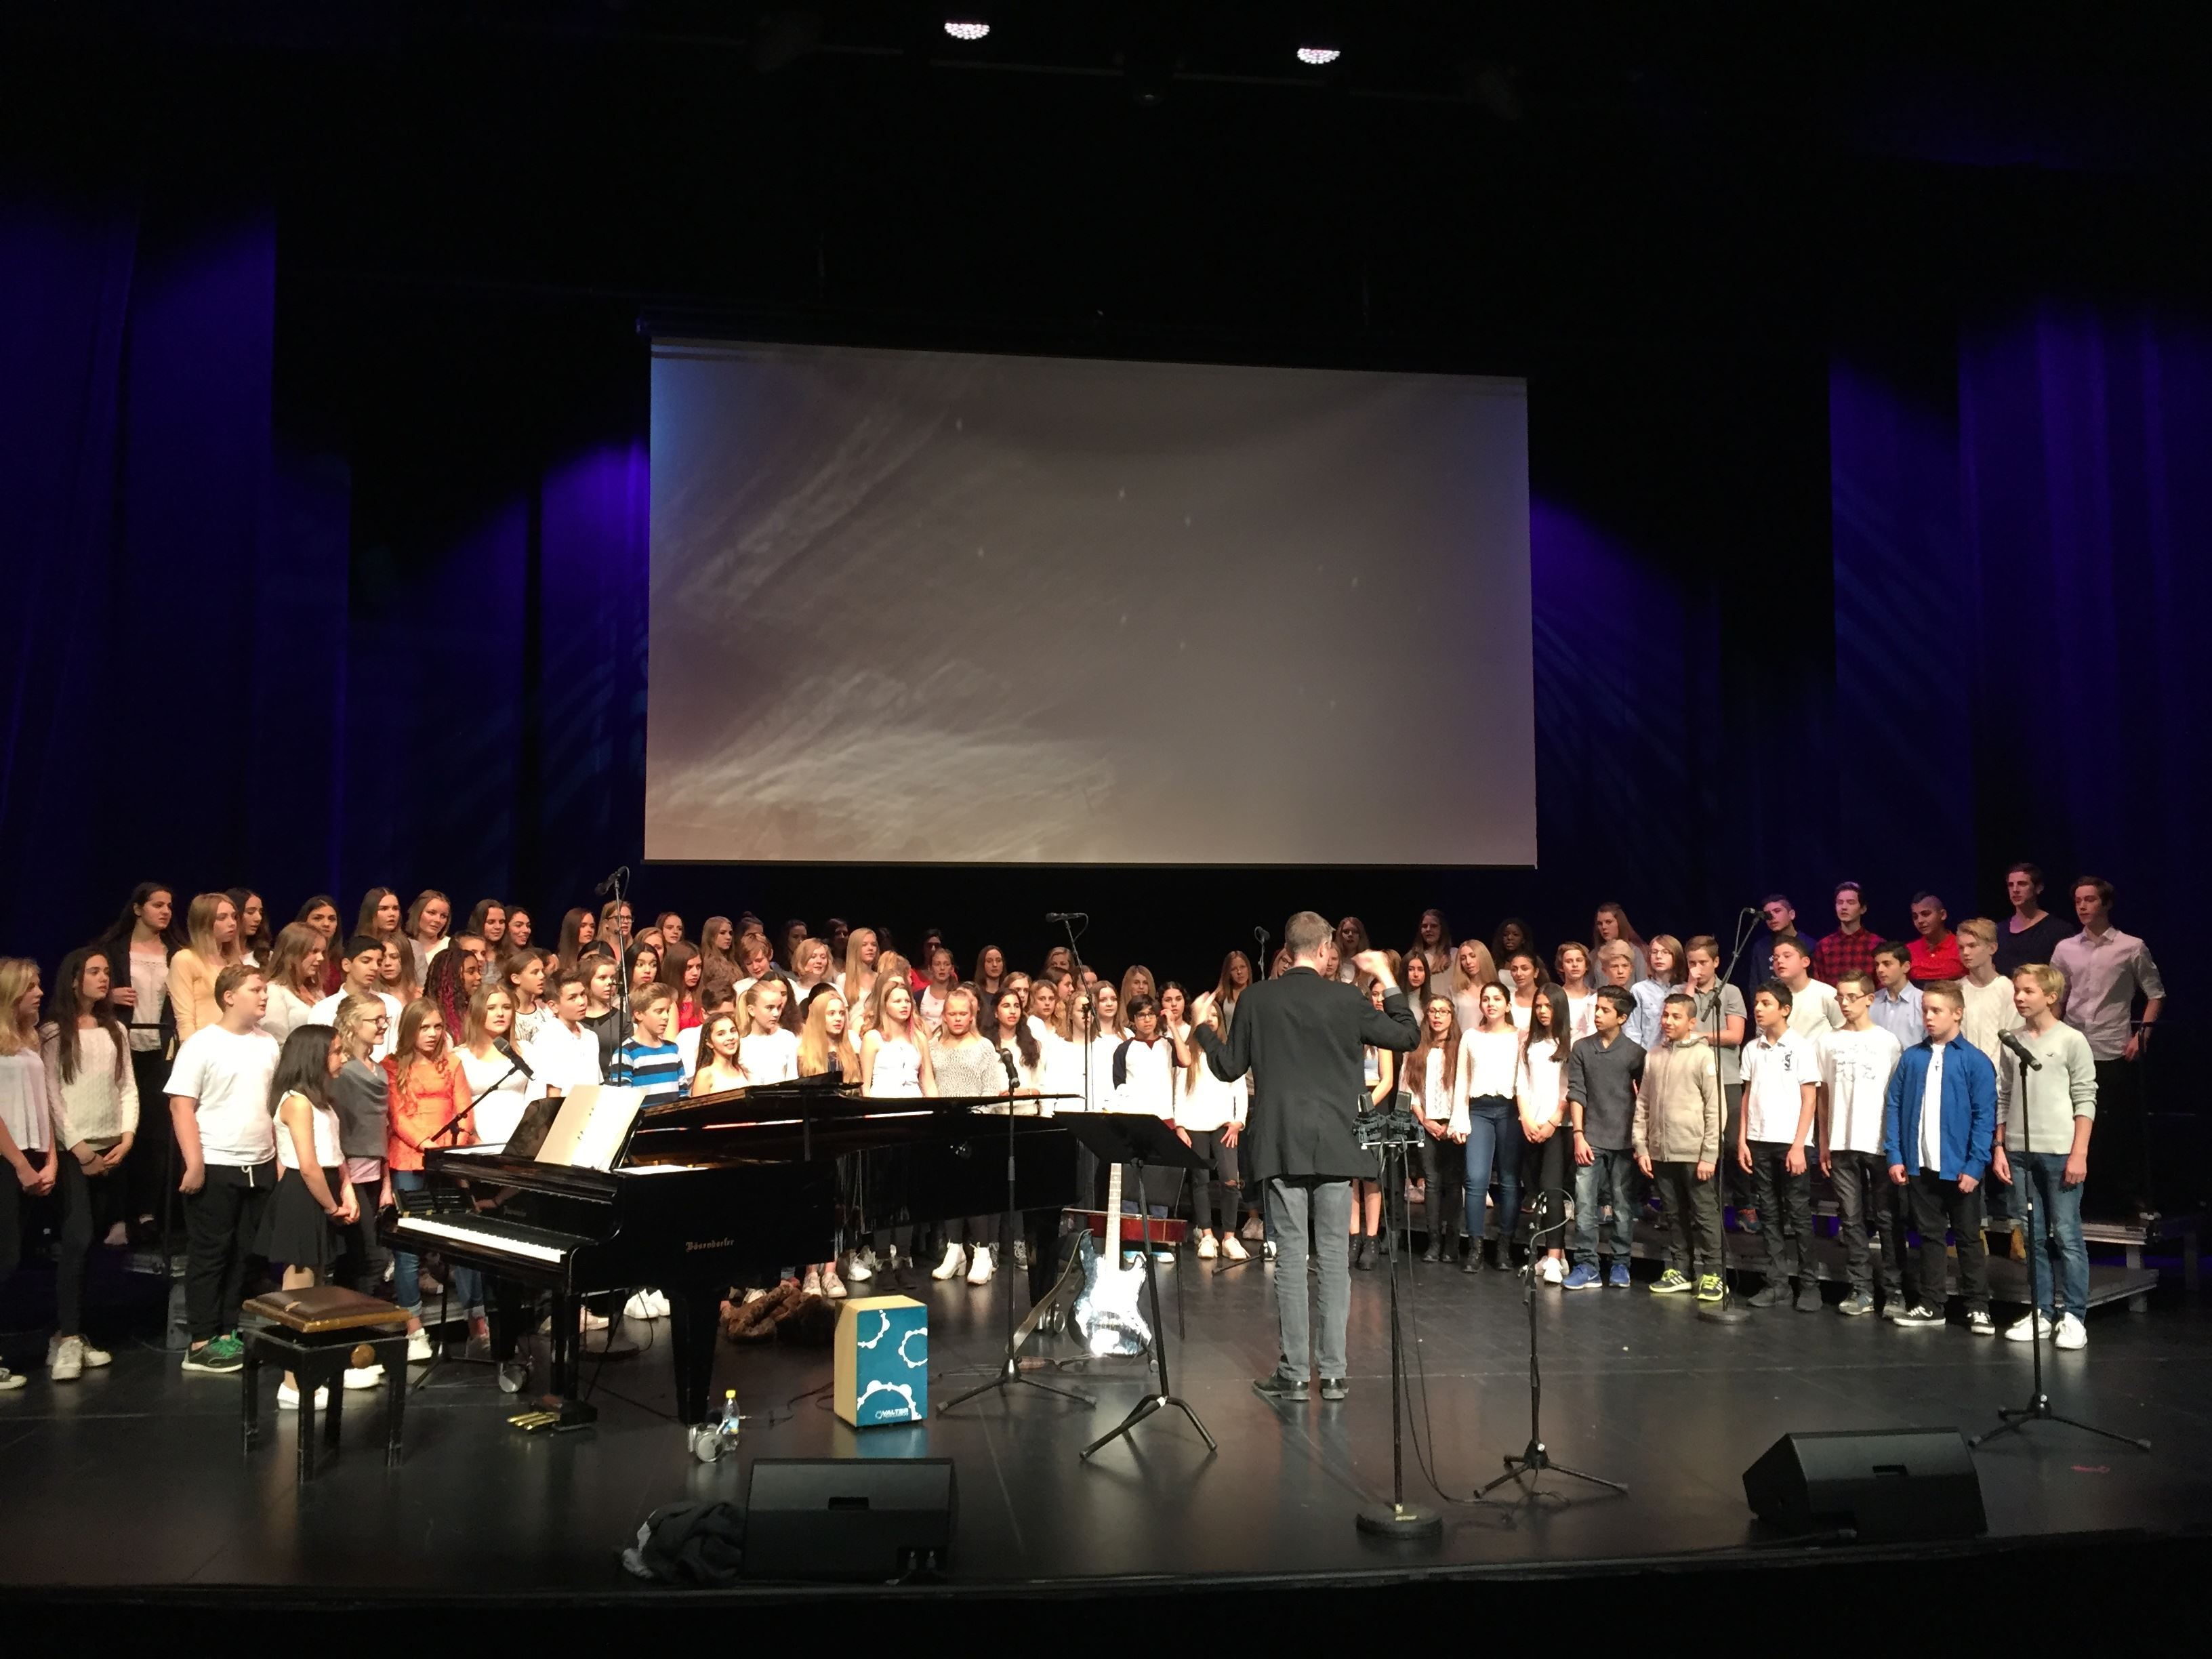 Vårkonsert på Hagaberg med Rosenborgsskolans musikklasser